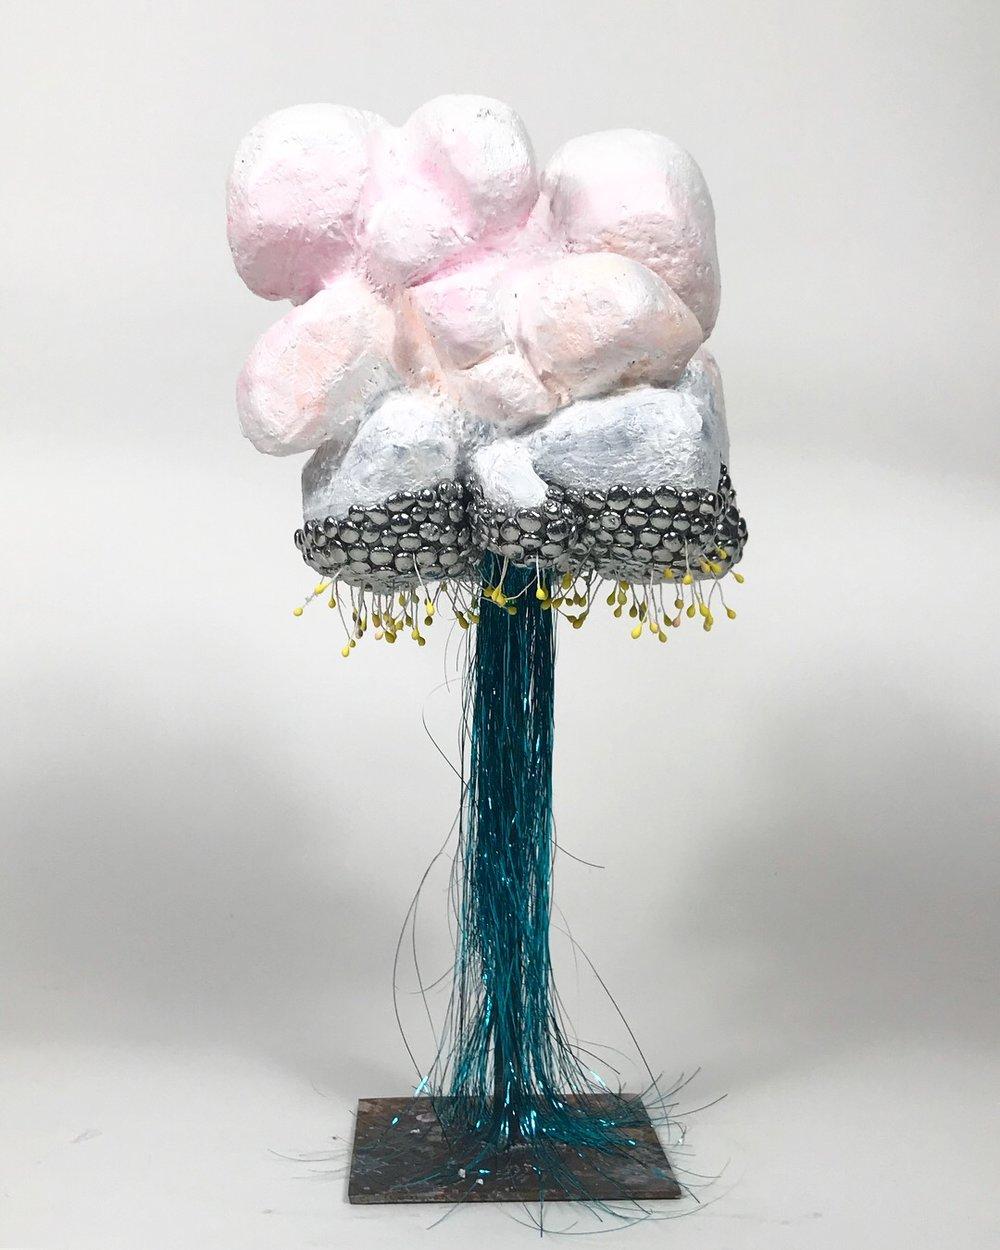 Micro Microburst , approx 12x6x6, mixedmedia sculpture, 2018